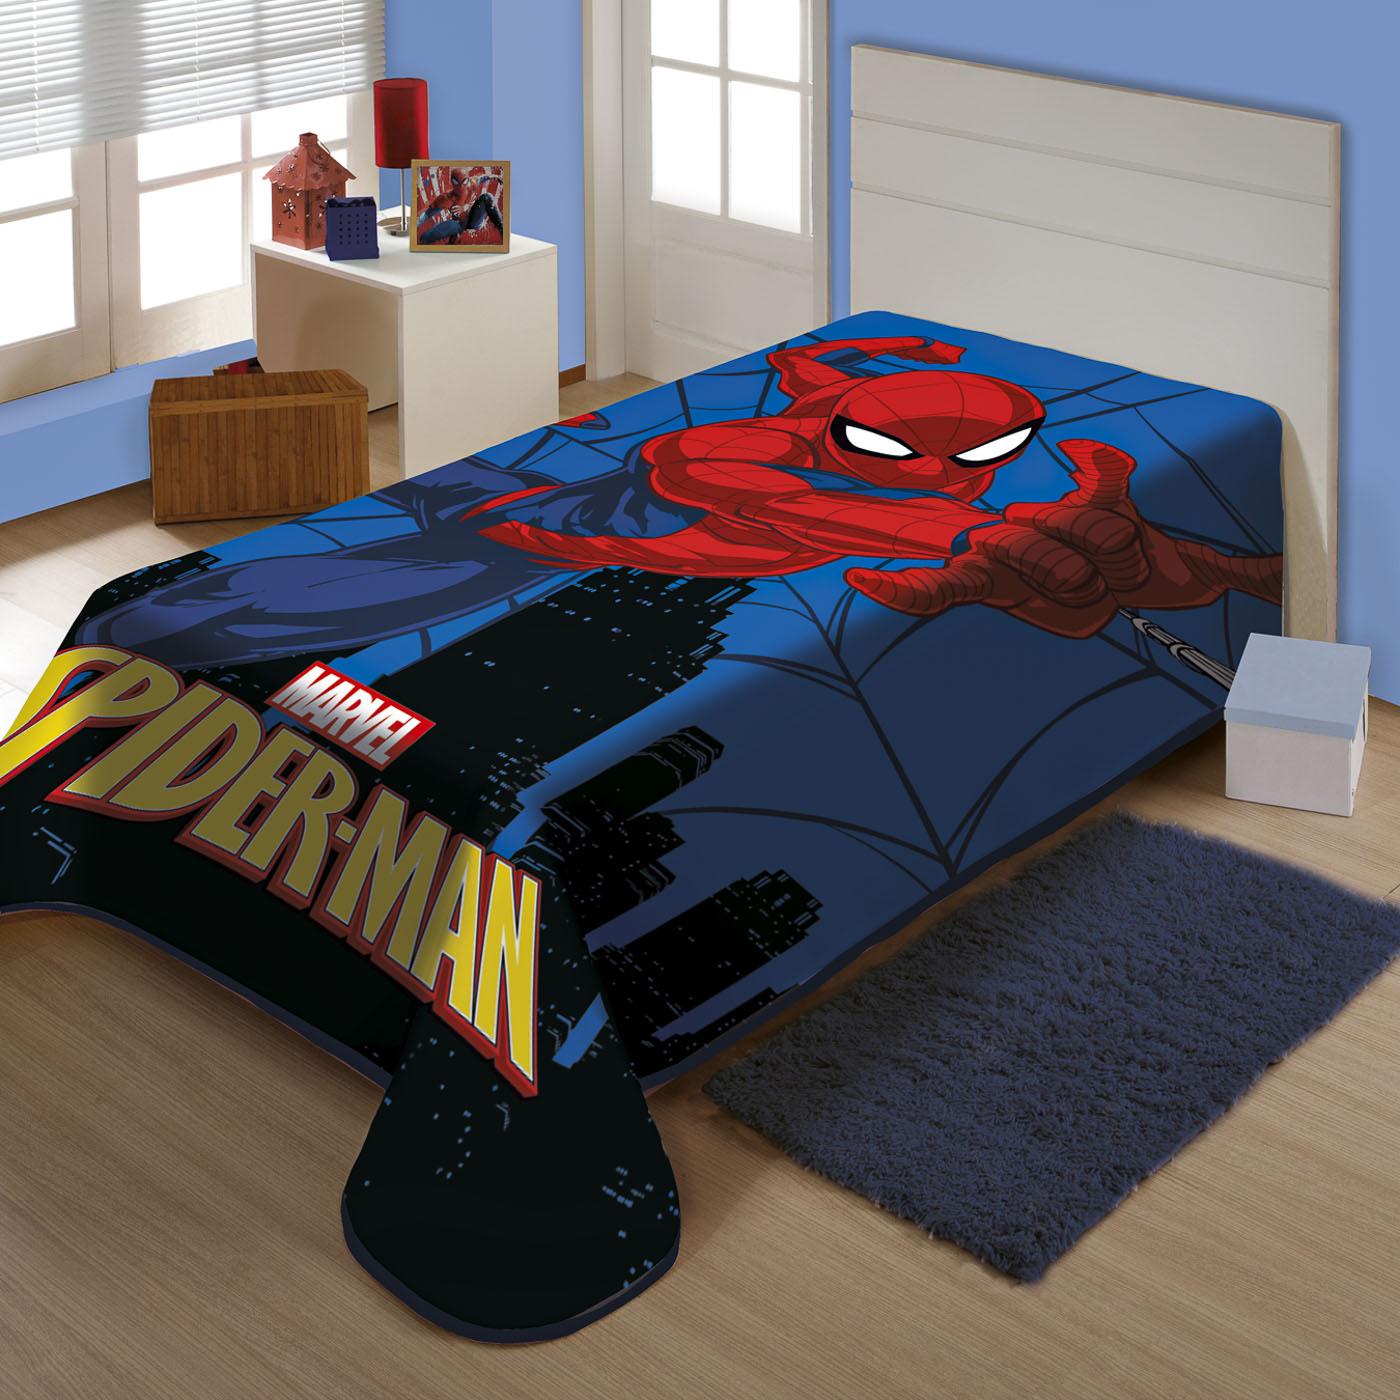 Cobertor Juvenil Raschel Plus Marvel Homem Aranha Jolitex